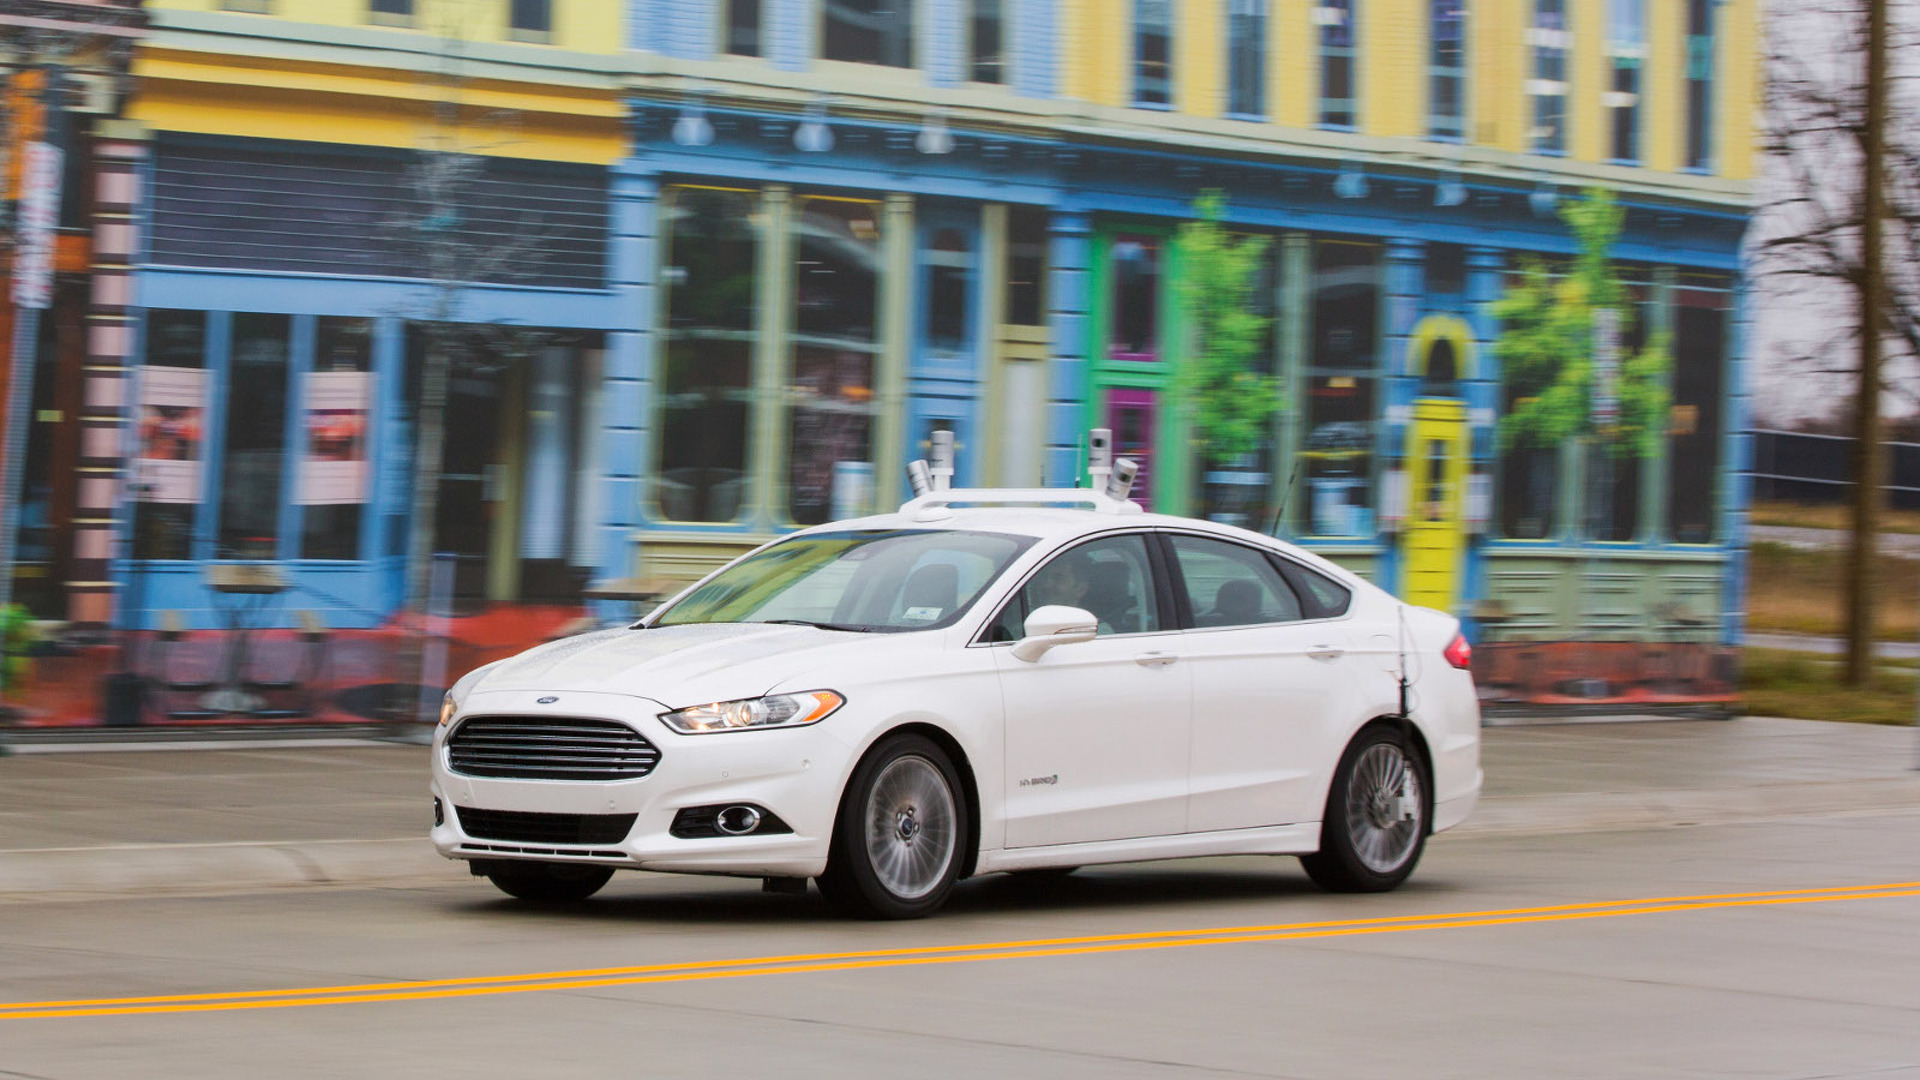 ford-fusion-hybrid-autonomous-research-vehicle1